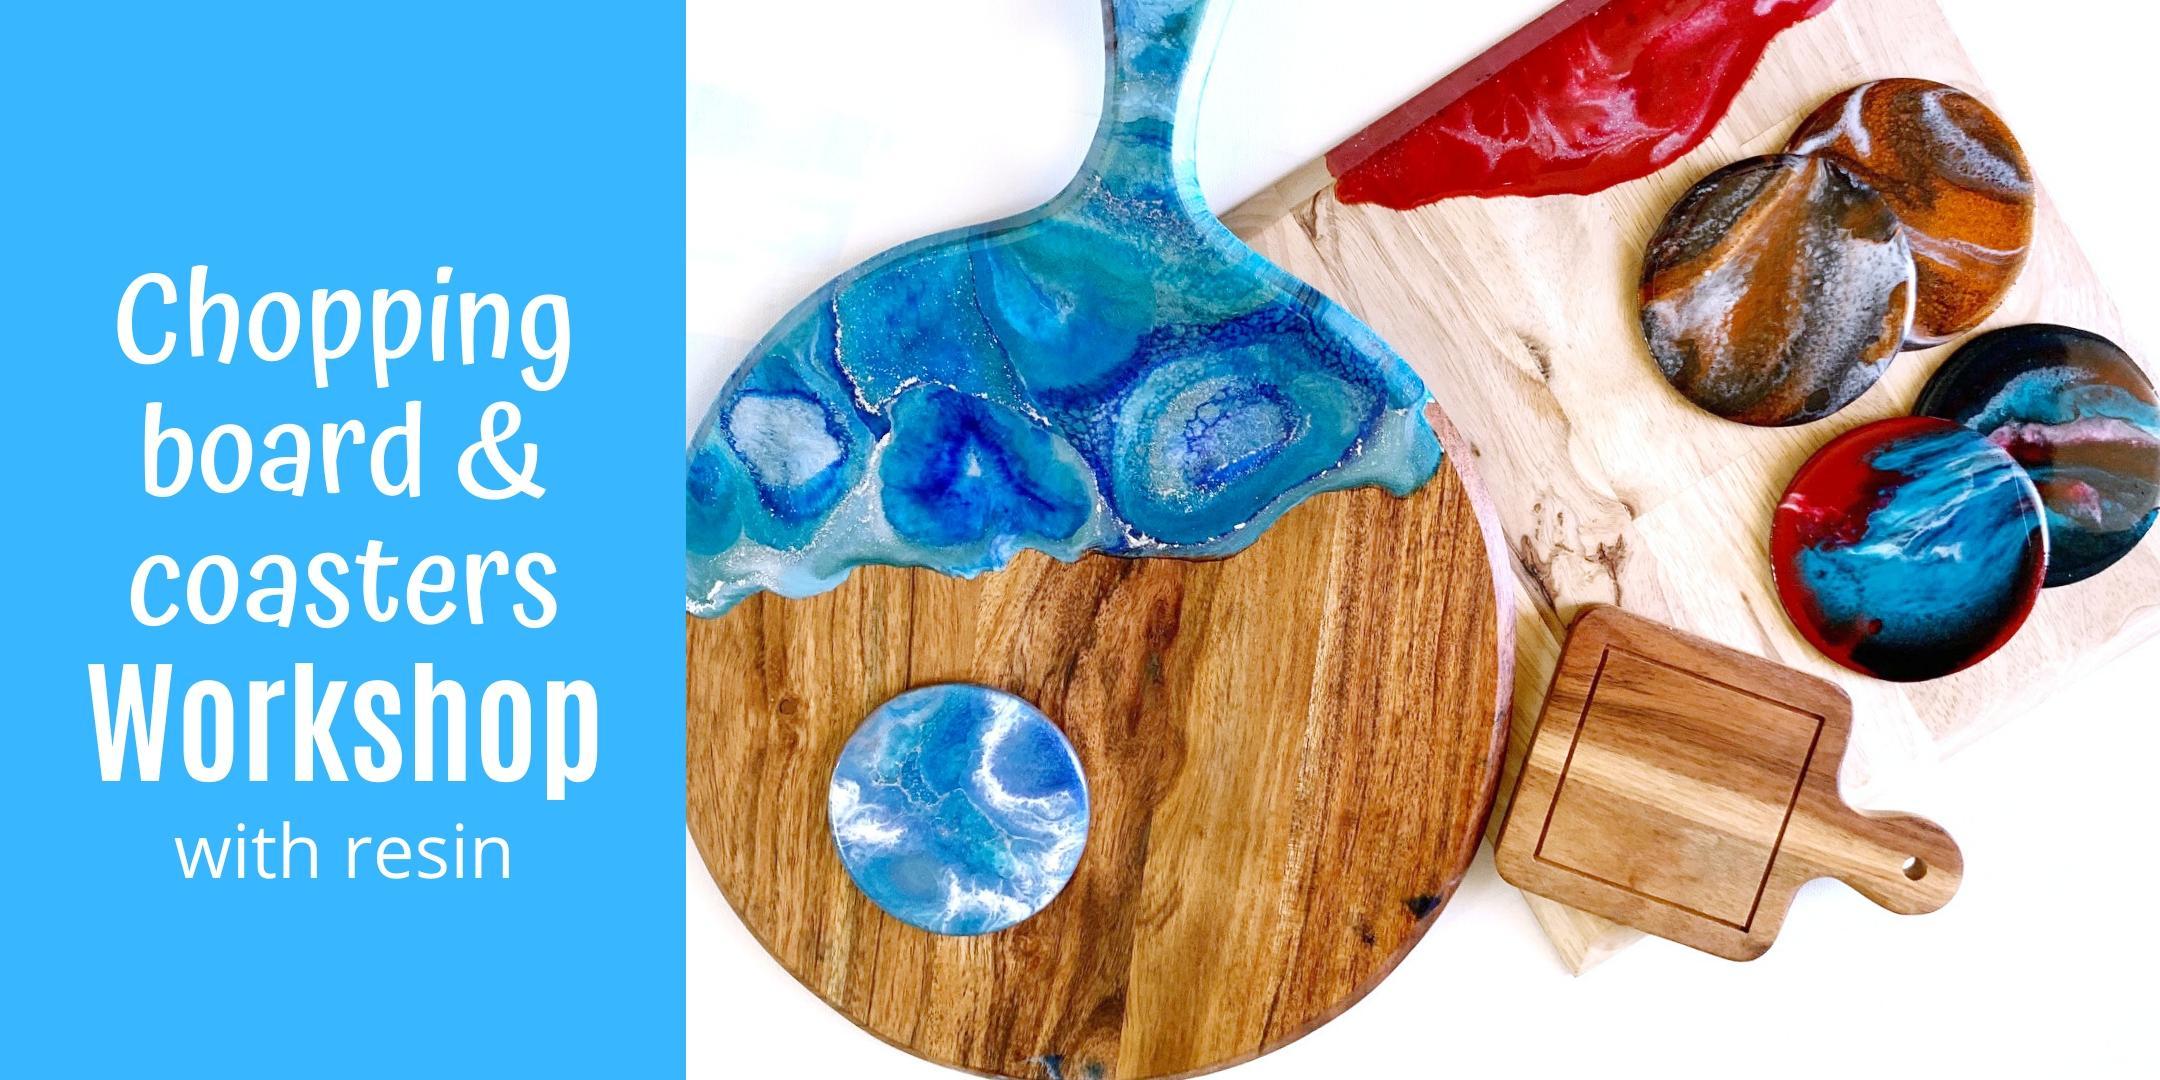 Resin Chopping Board & Coasters Workshop